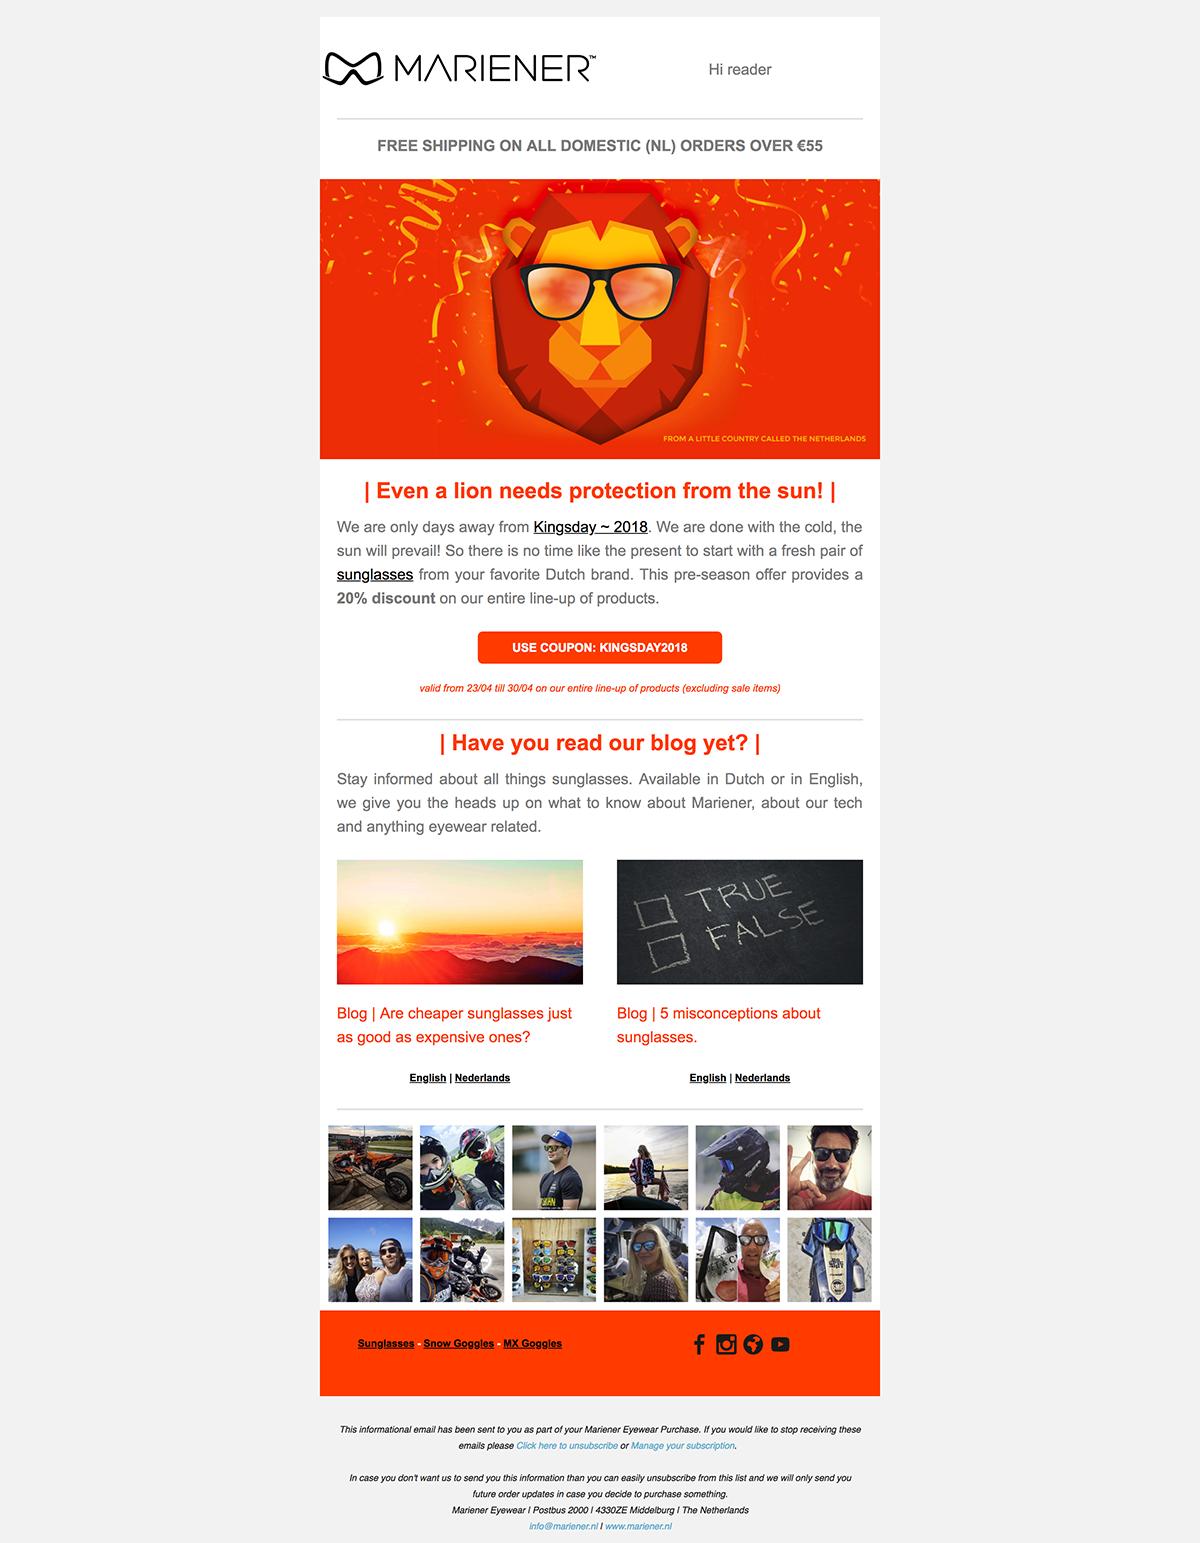 Mariener email example.